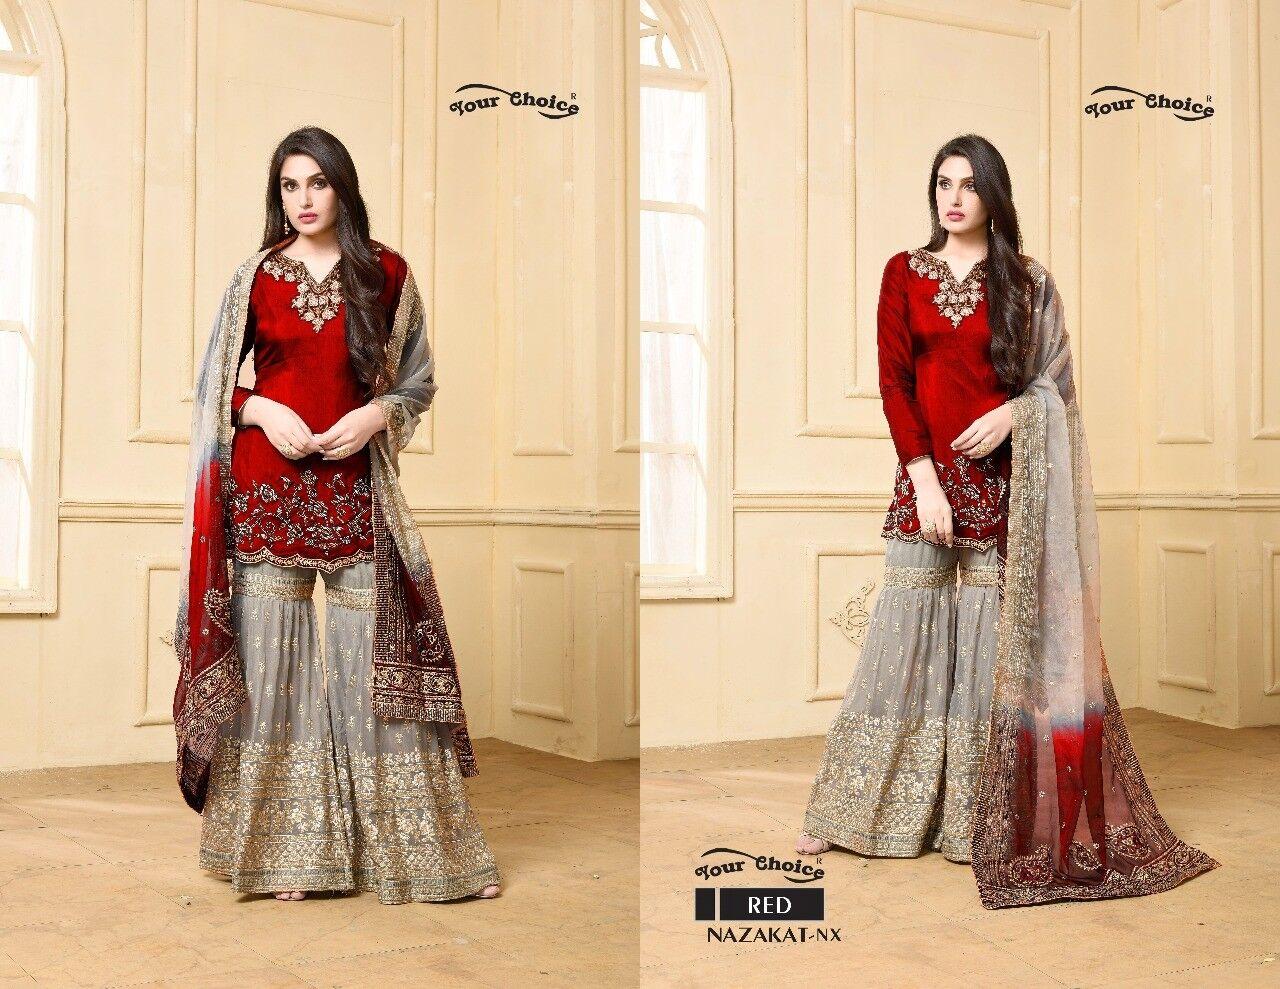 Indian Designer Shraras Suit Fully stitched your choice NX Red Shalwar kameez